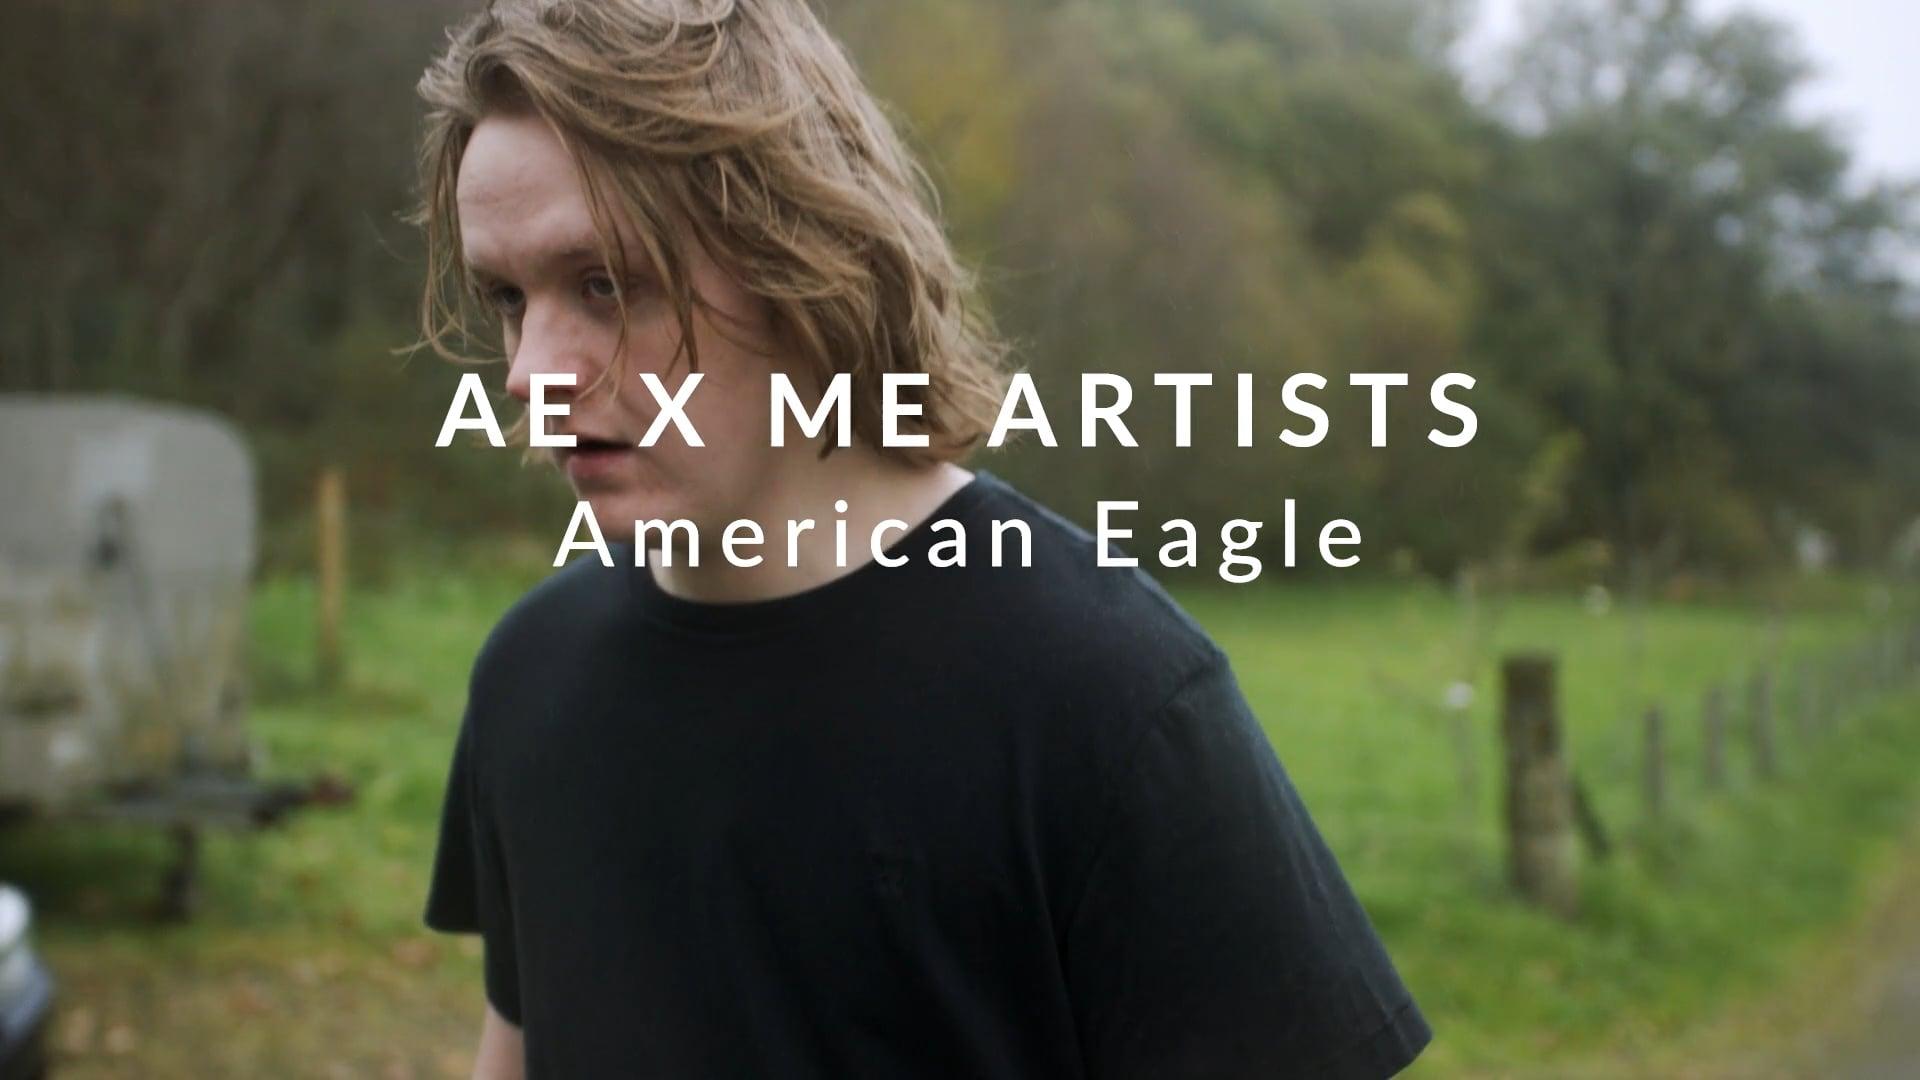 American Eagle Lewis Capaldi